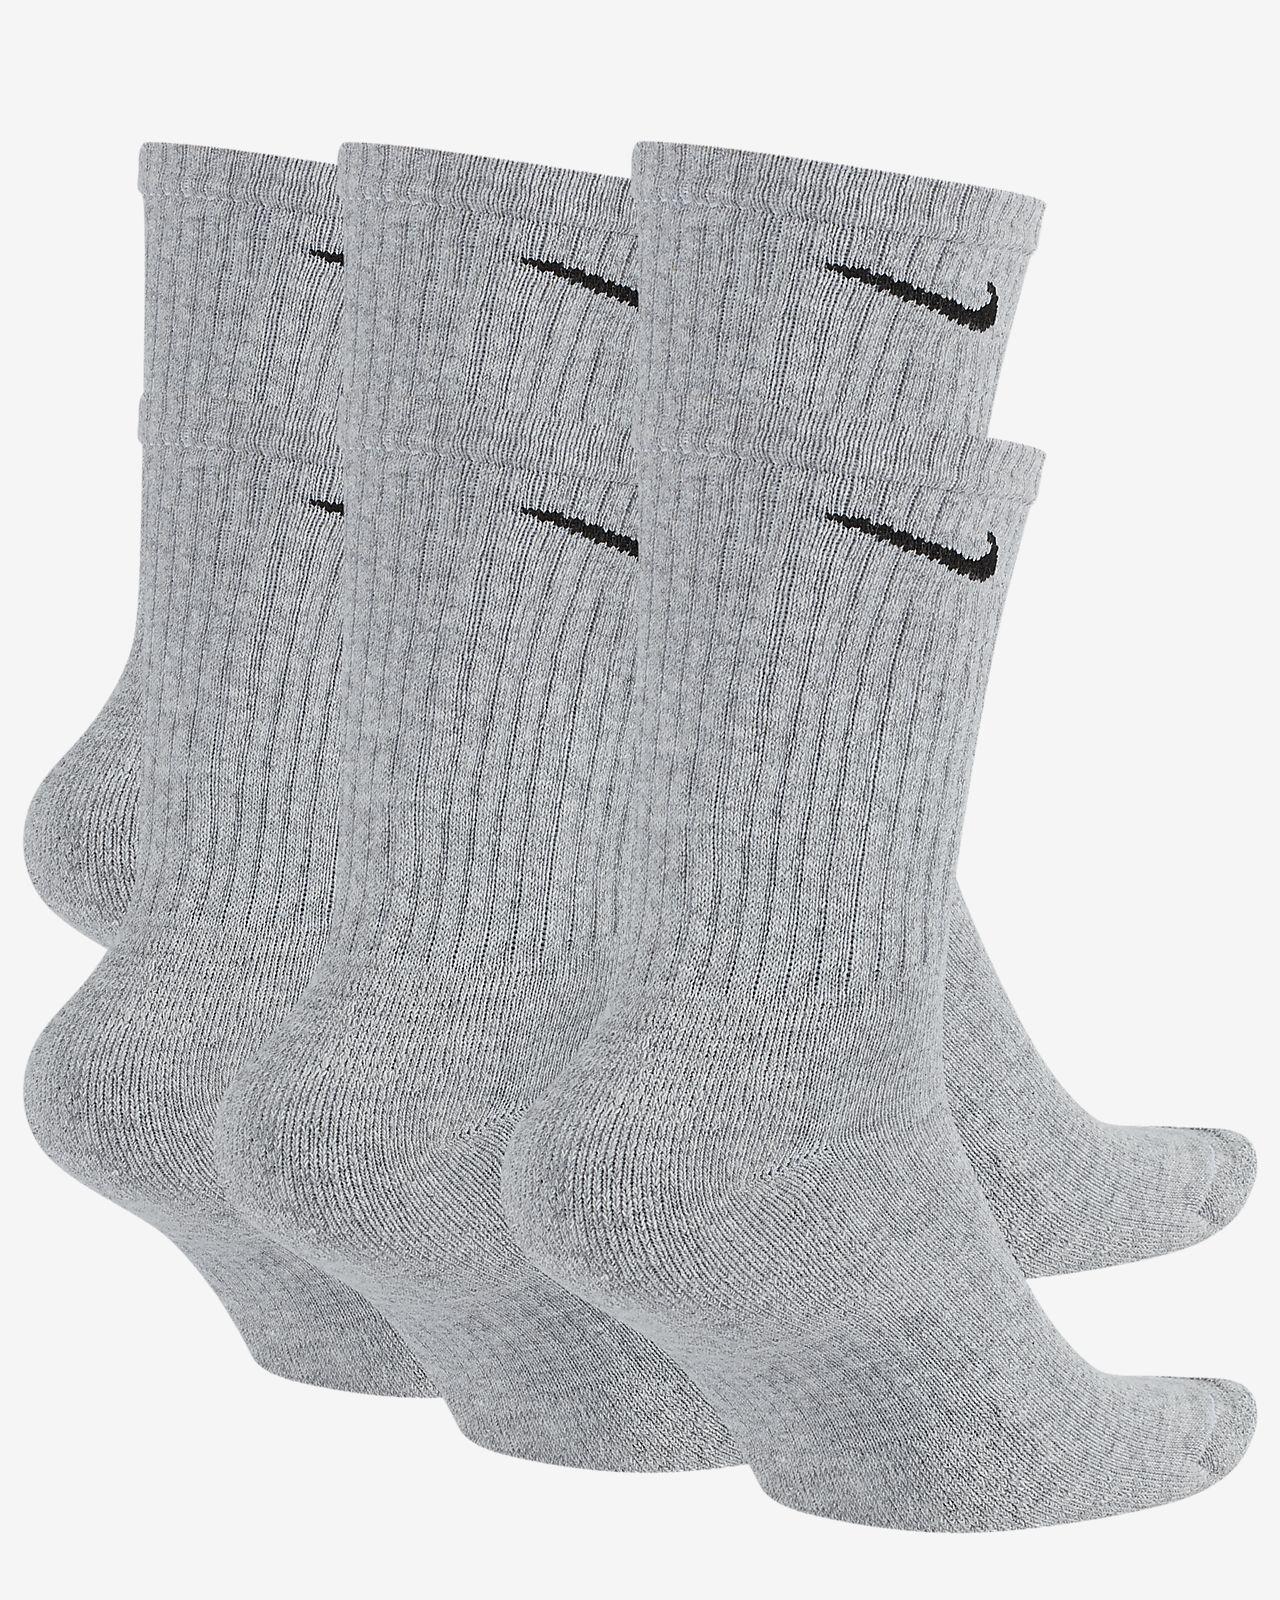 9f4c23ff3 Nike Everyday Cushion Crew Training Socks (6 Pair). Nike.com